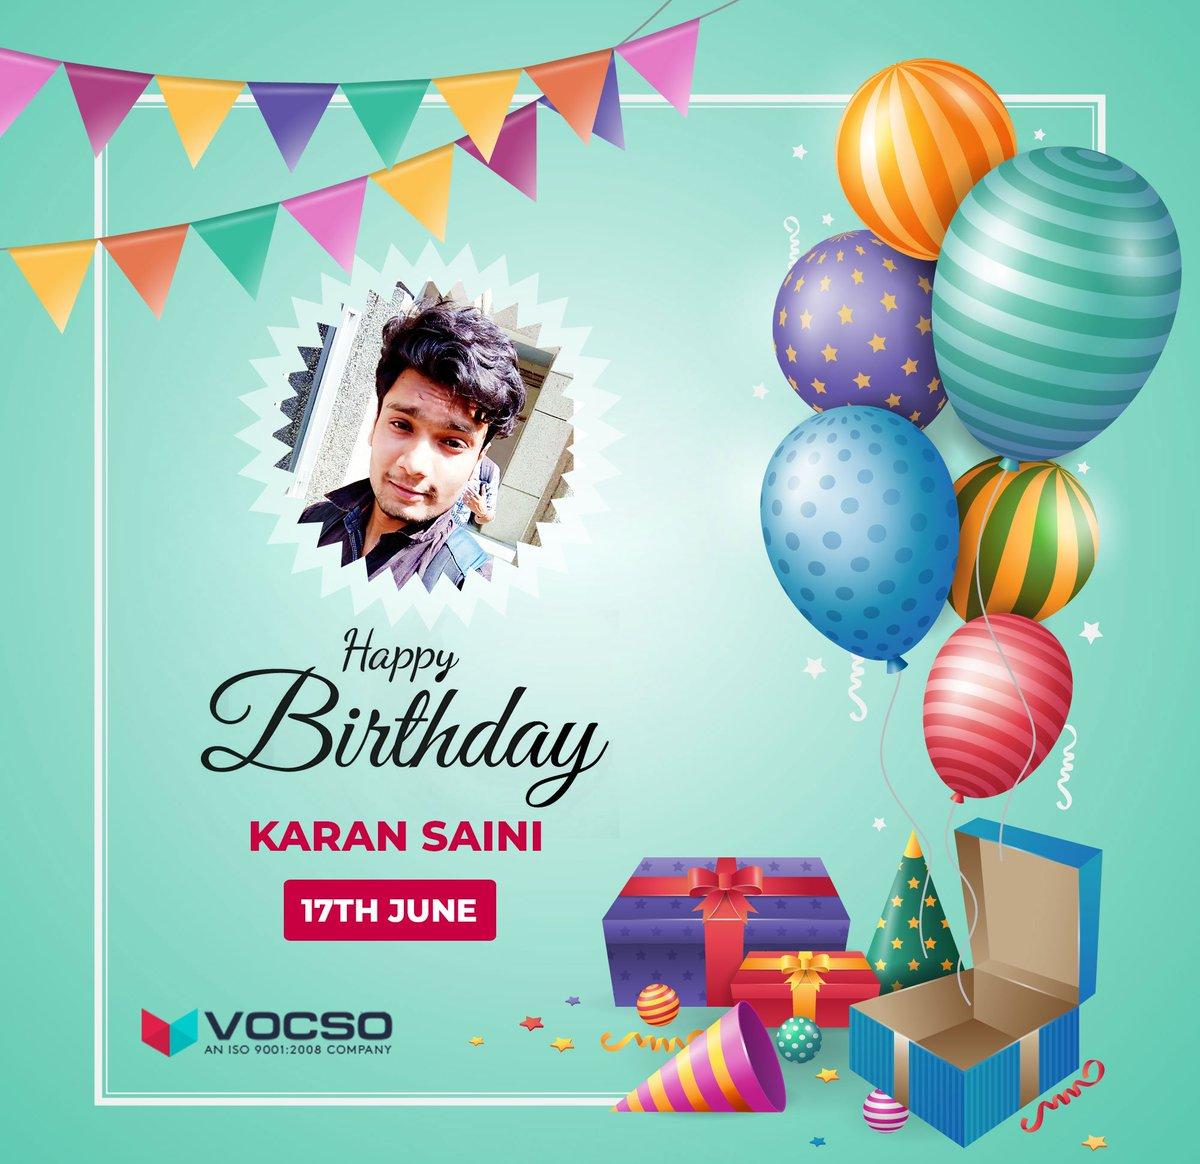 VOCSO Wishes Karan Saini, a very happy birthday